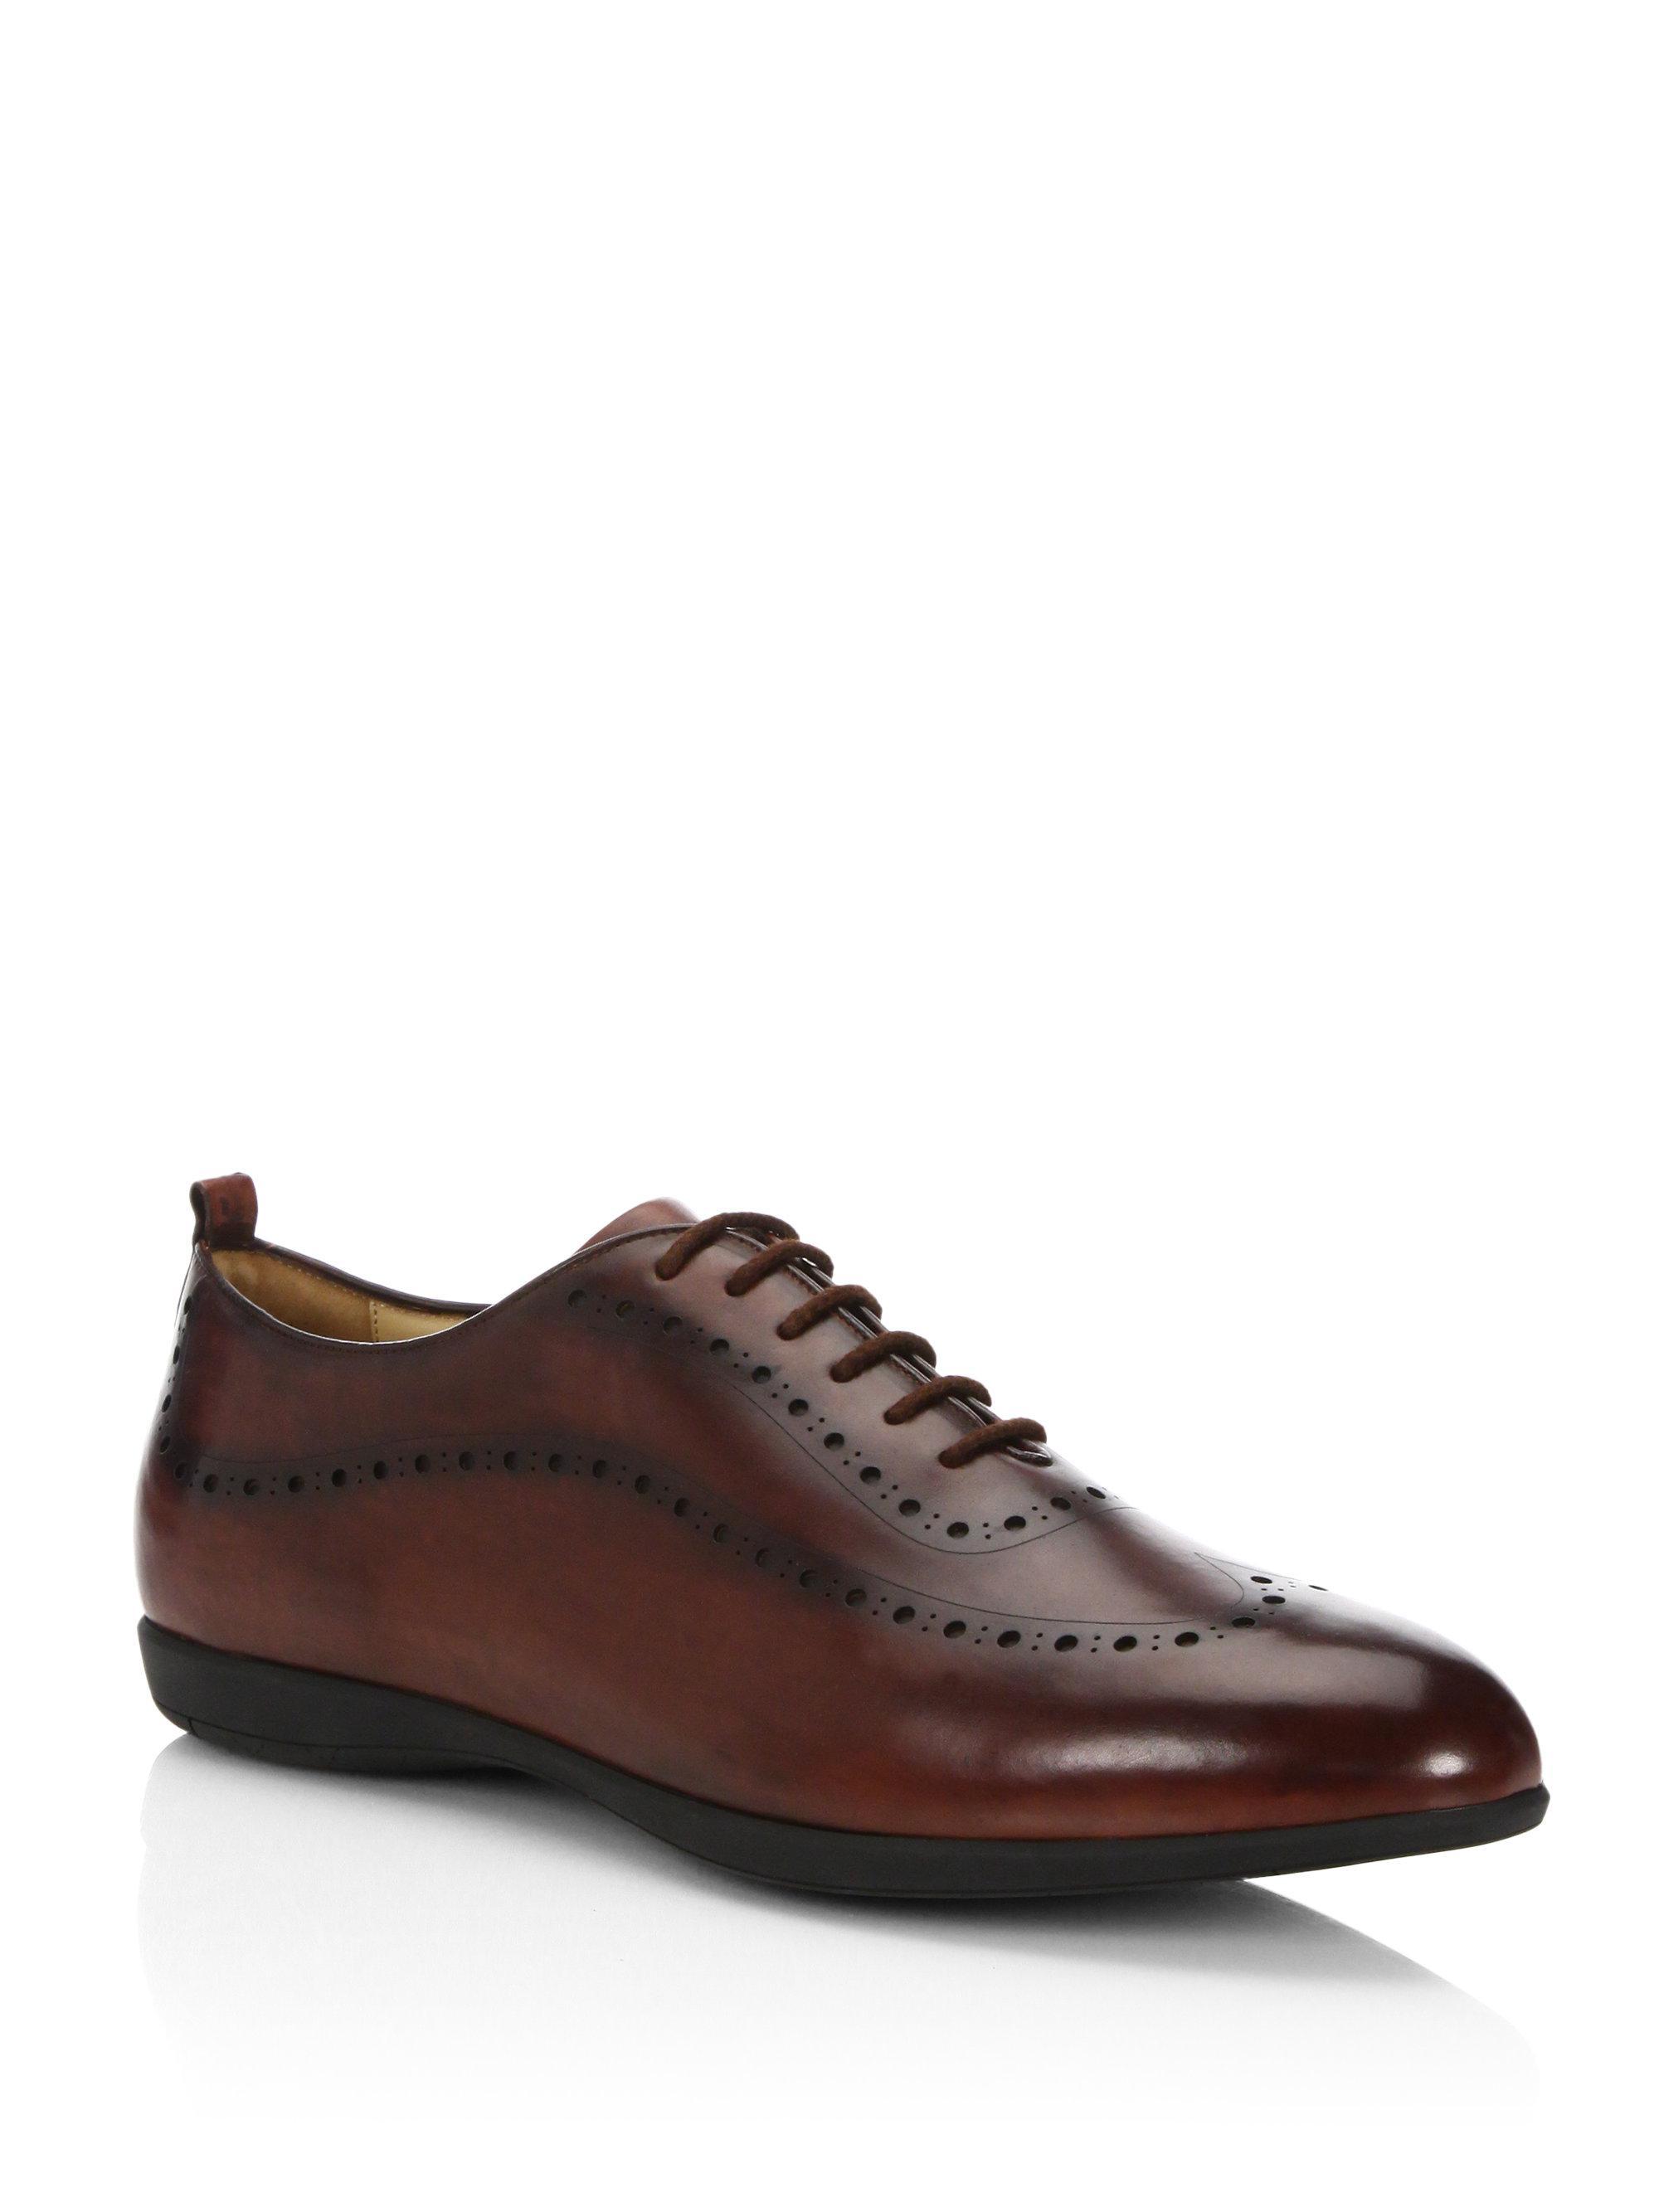 FOOTWEAR - Low-tops & sneakers Sutor Mantellassi QNHRk88NL